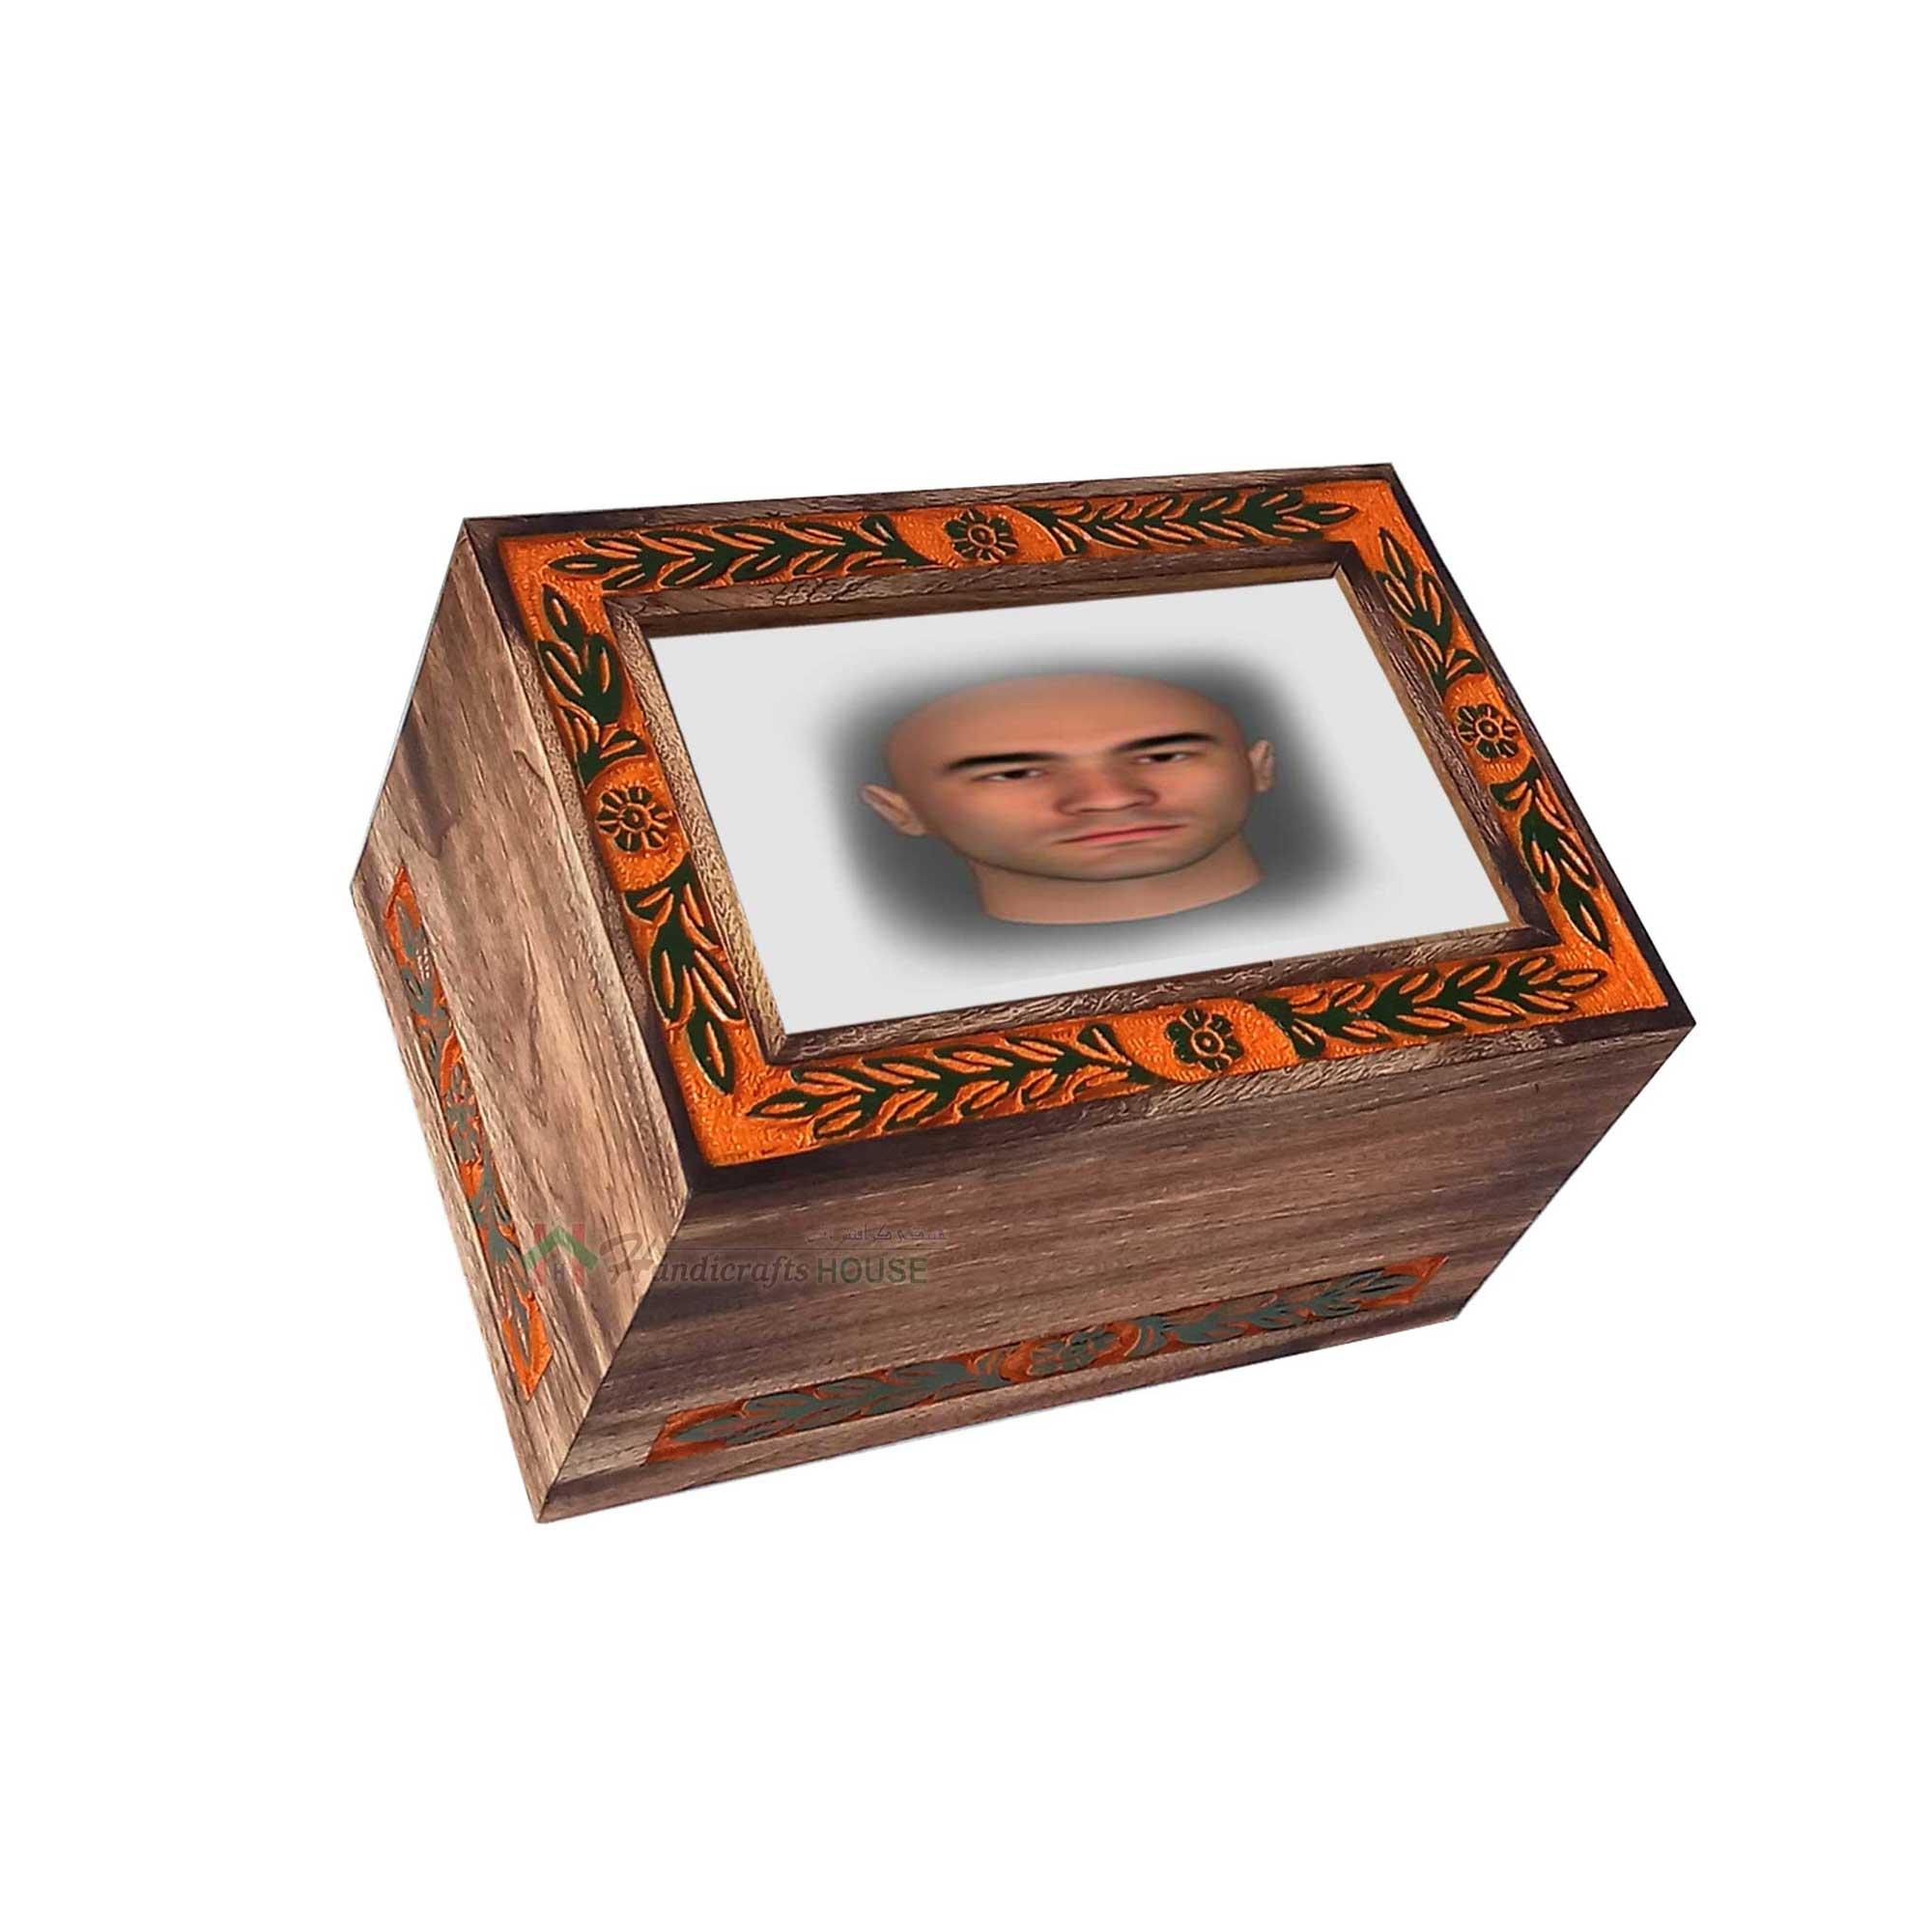 Urns for Human Ashes, Pet Cremation Urn, Wooden keepsake box